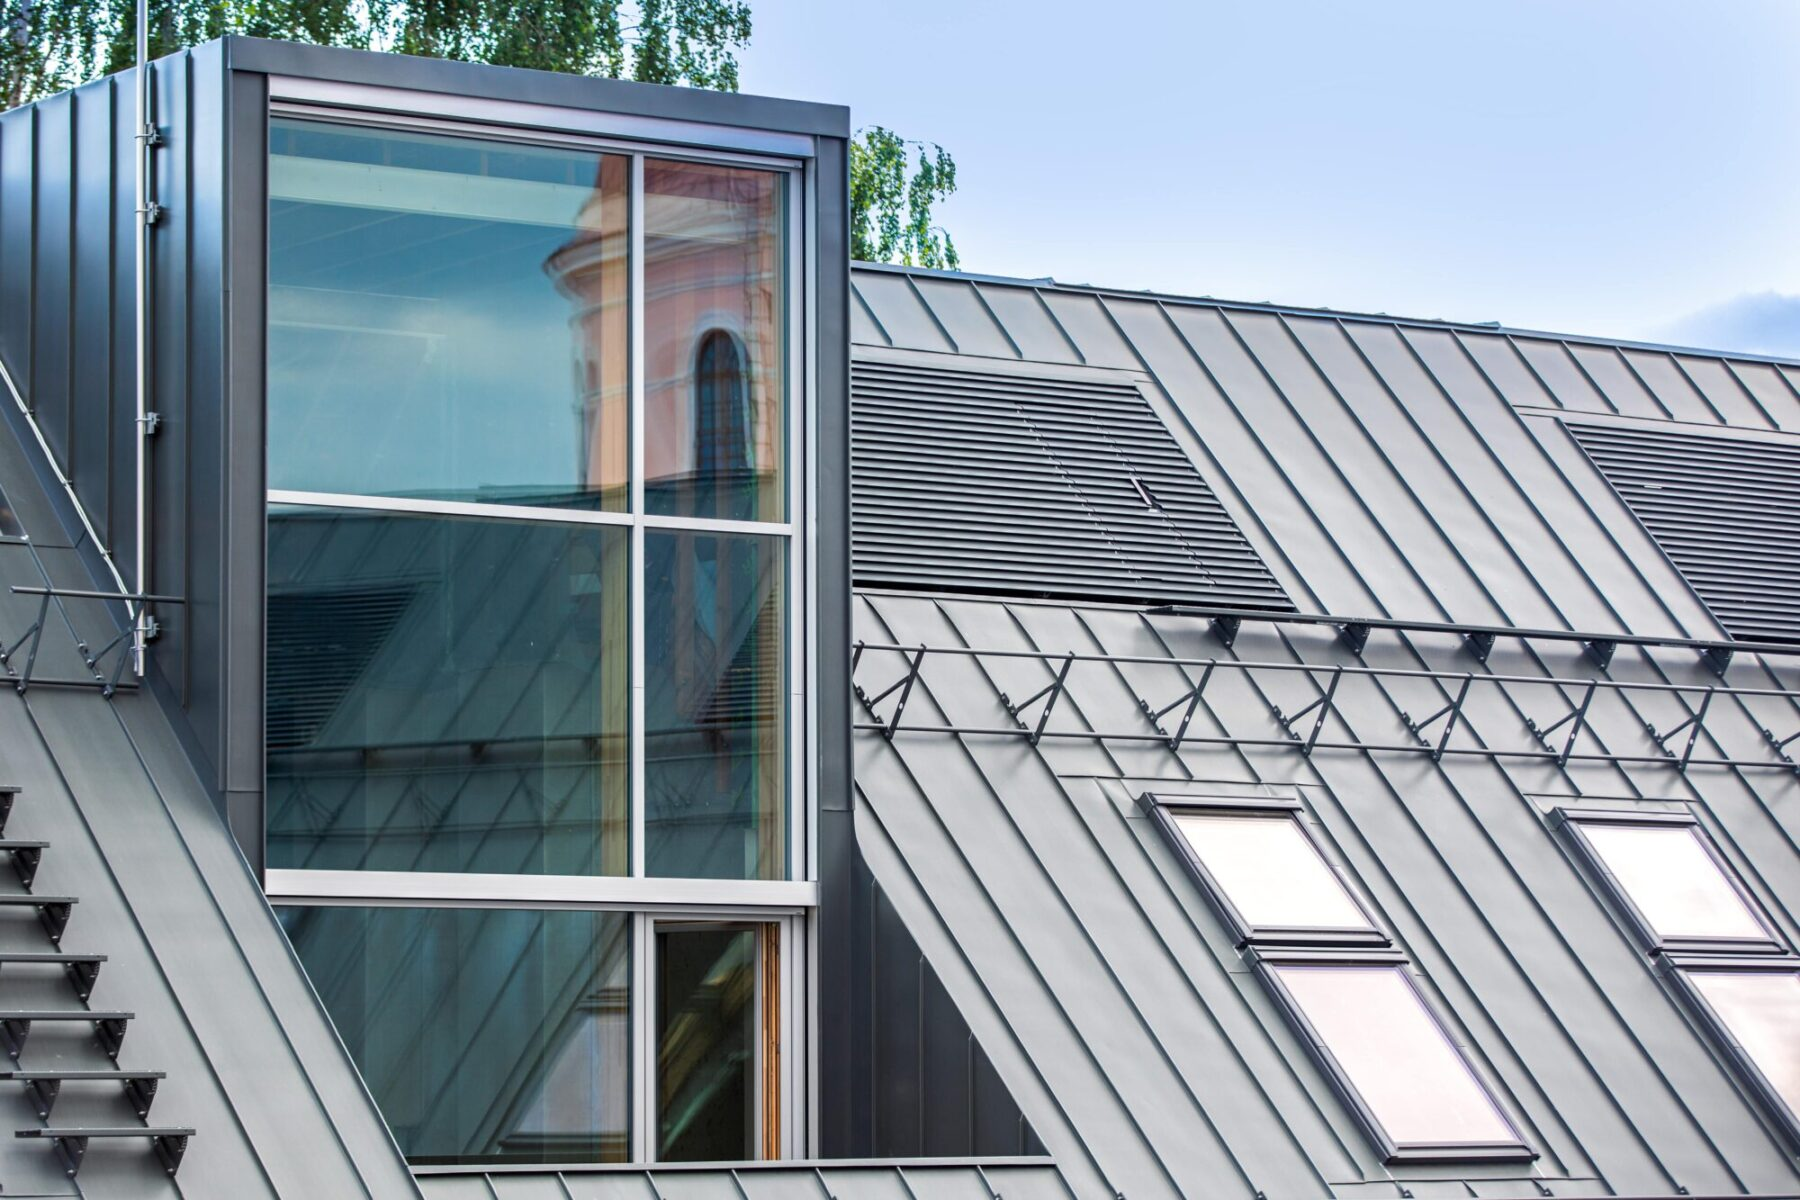 Fasadas-Aluvogas-Merko (5) - Copy